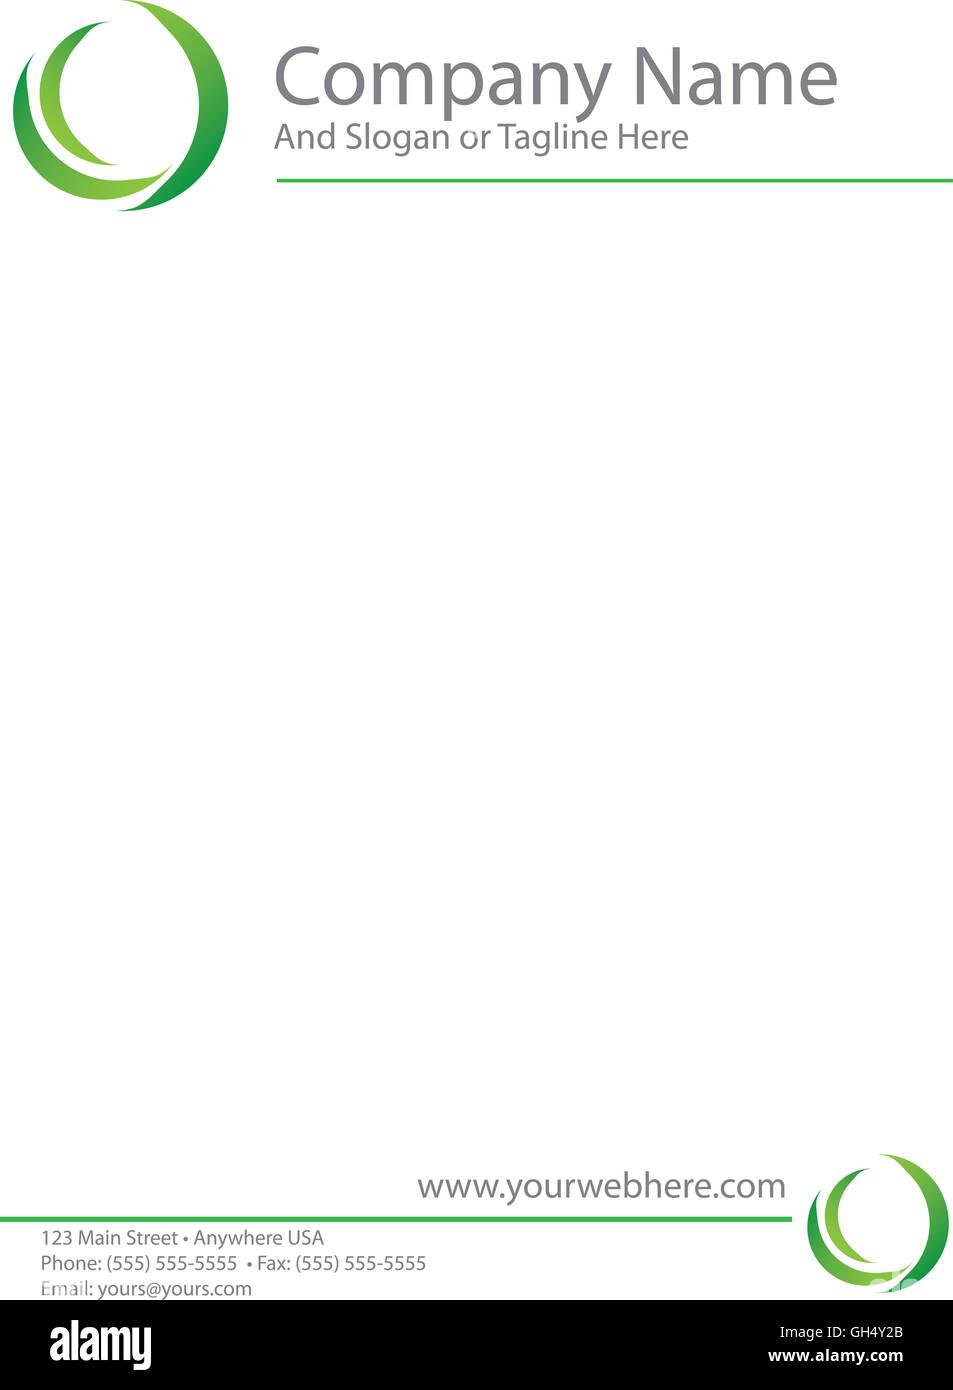 Green Logo Letterhead Template - Stock Image